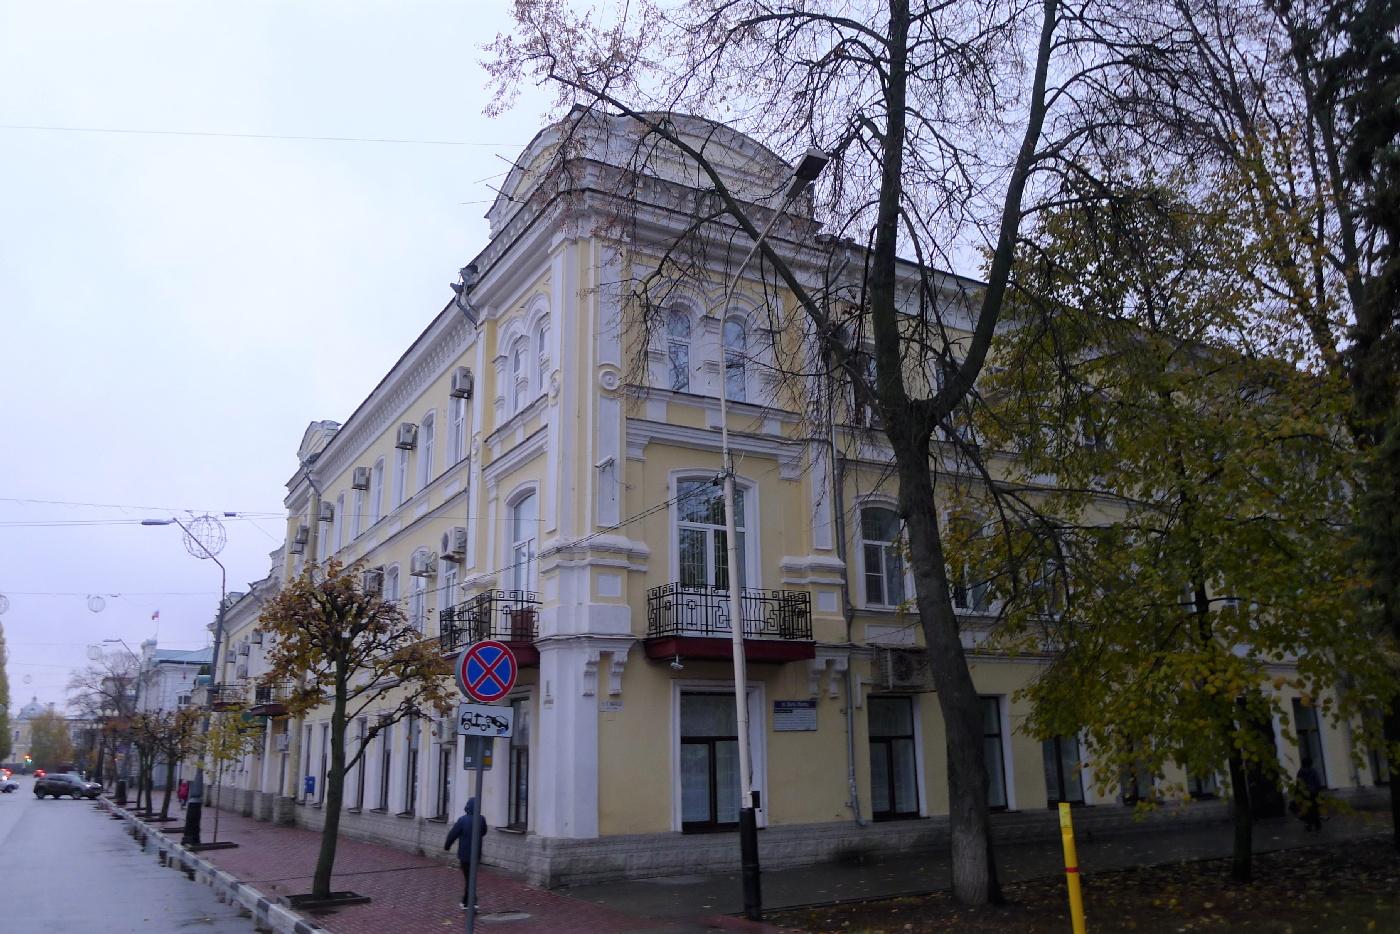 Русский Юг: Тамбов (Усадьба Асеевых, город) P1100377